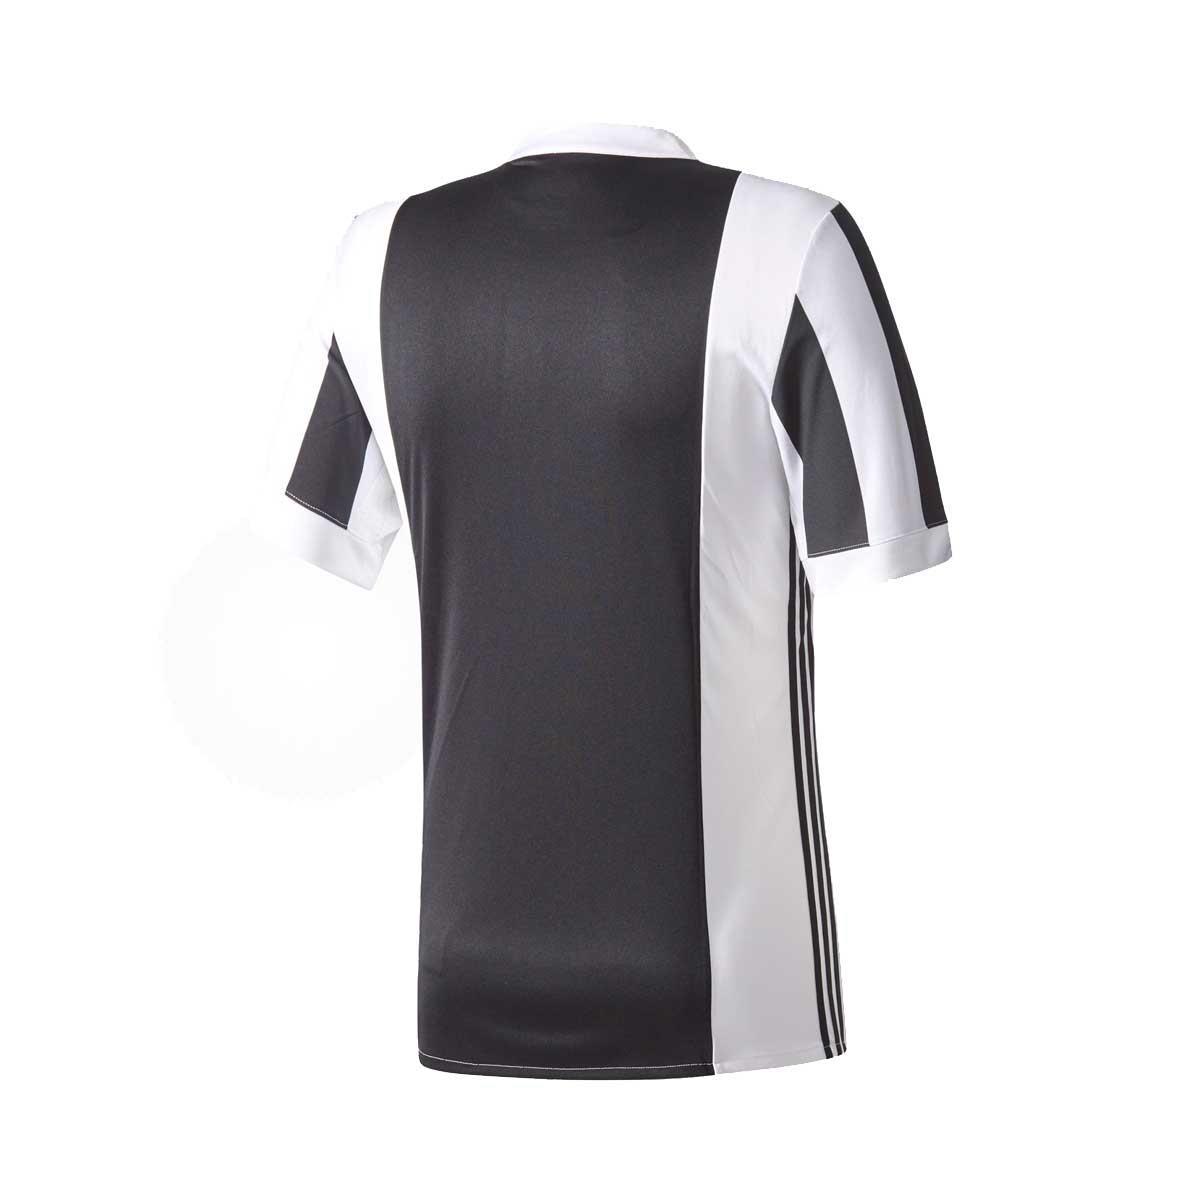 859b27f6a Camisa Adidas Juventus I 2017 2018 Masculina